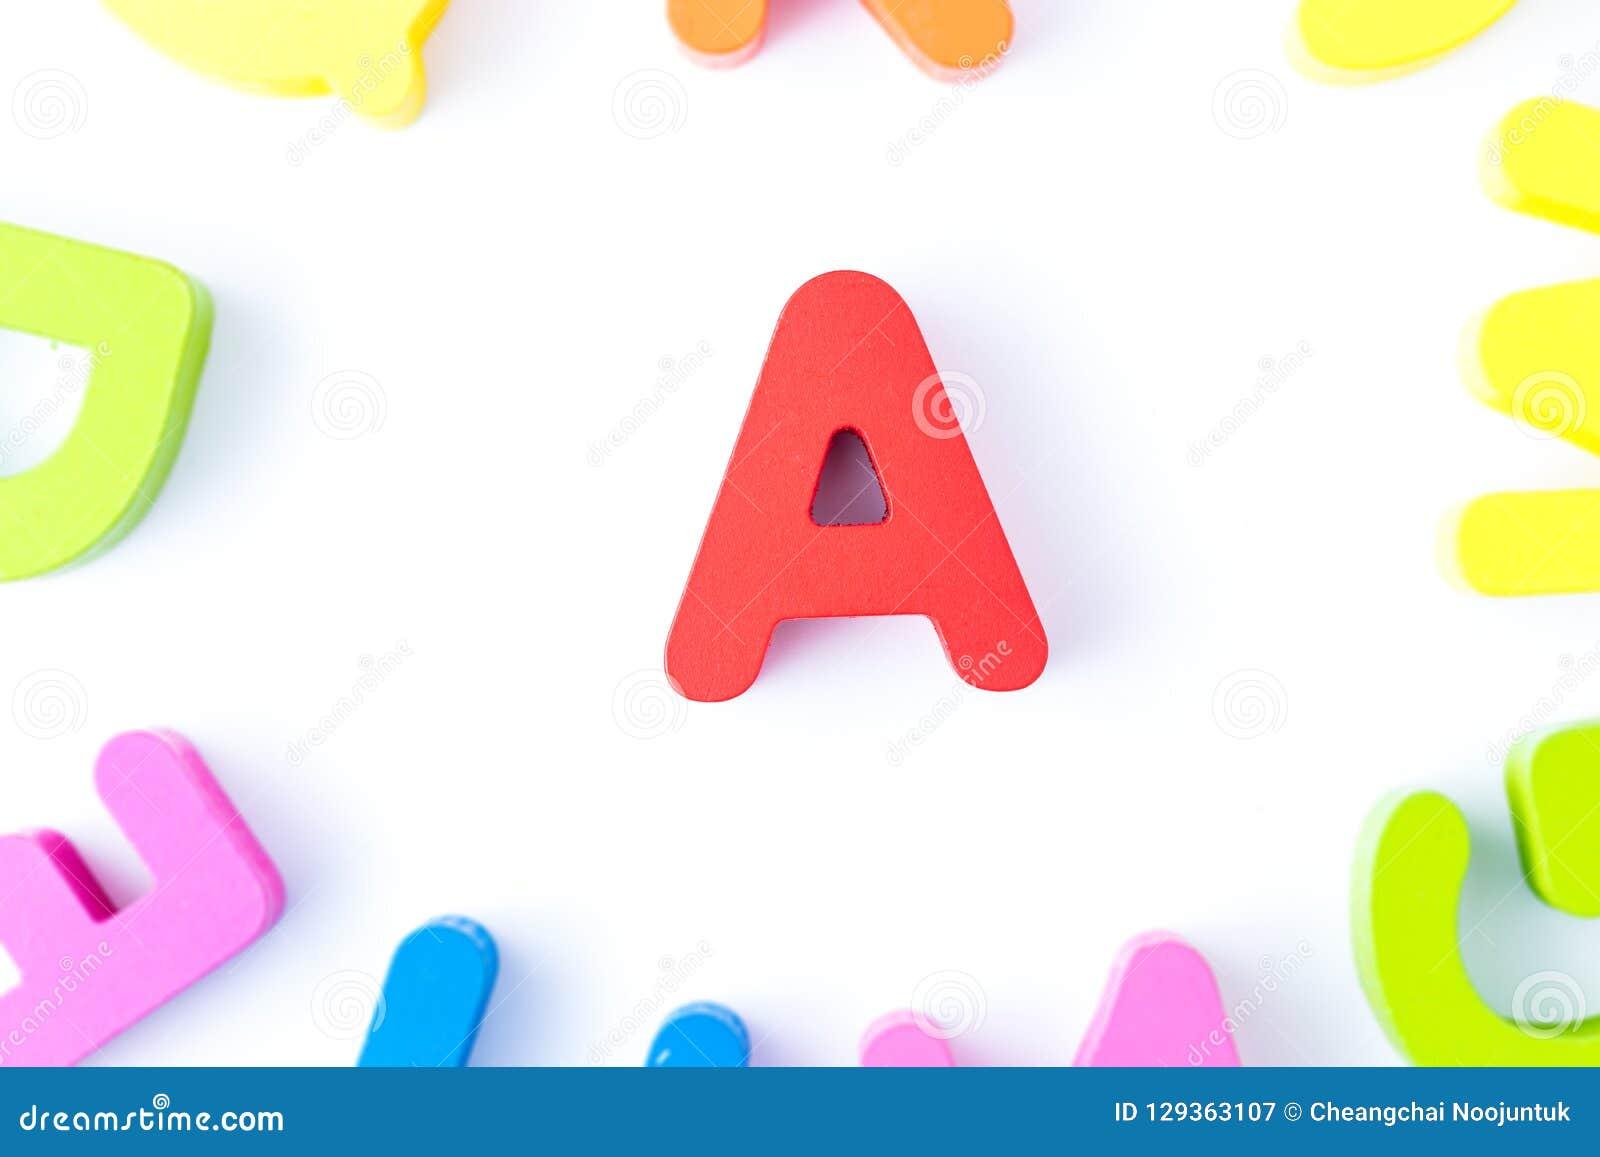 Lettere in inglese